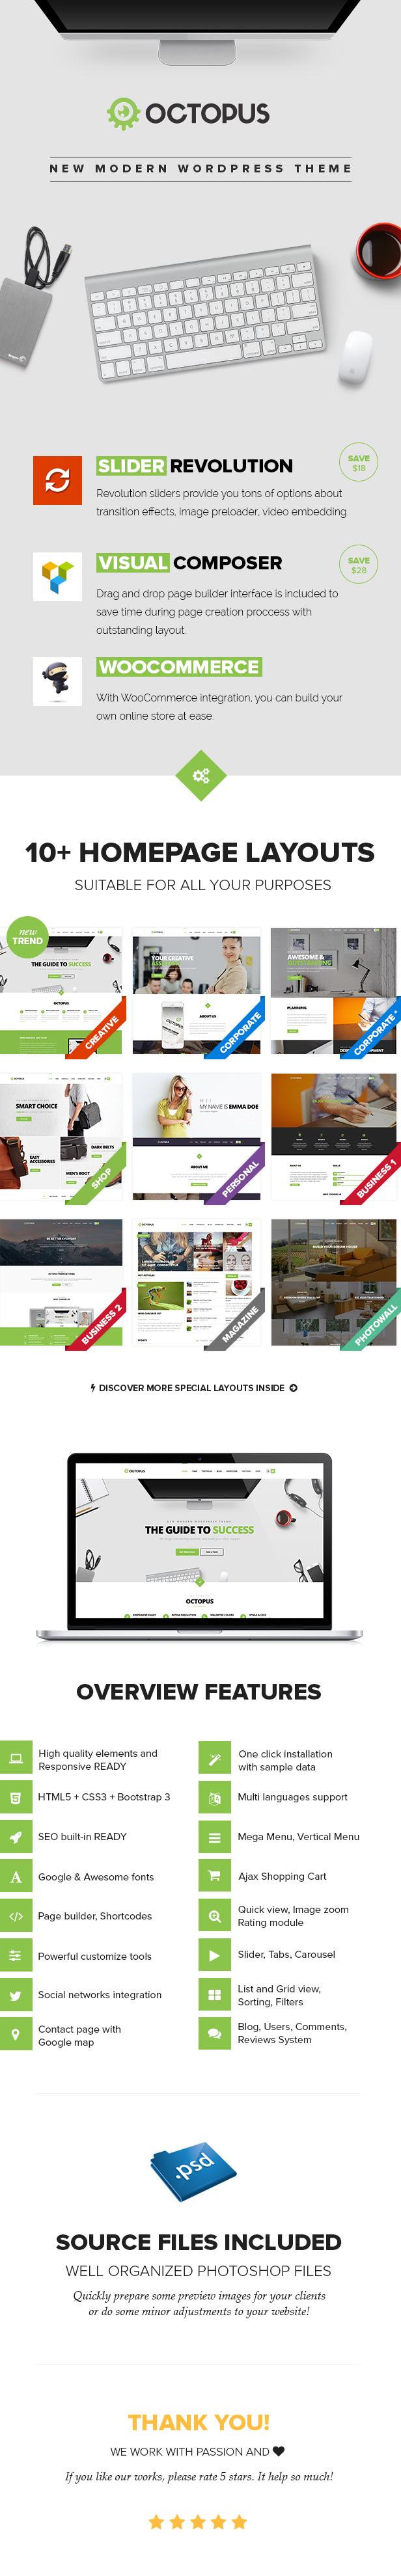 Octopus - Multipurpose Business WordPress Theme - 6